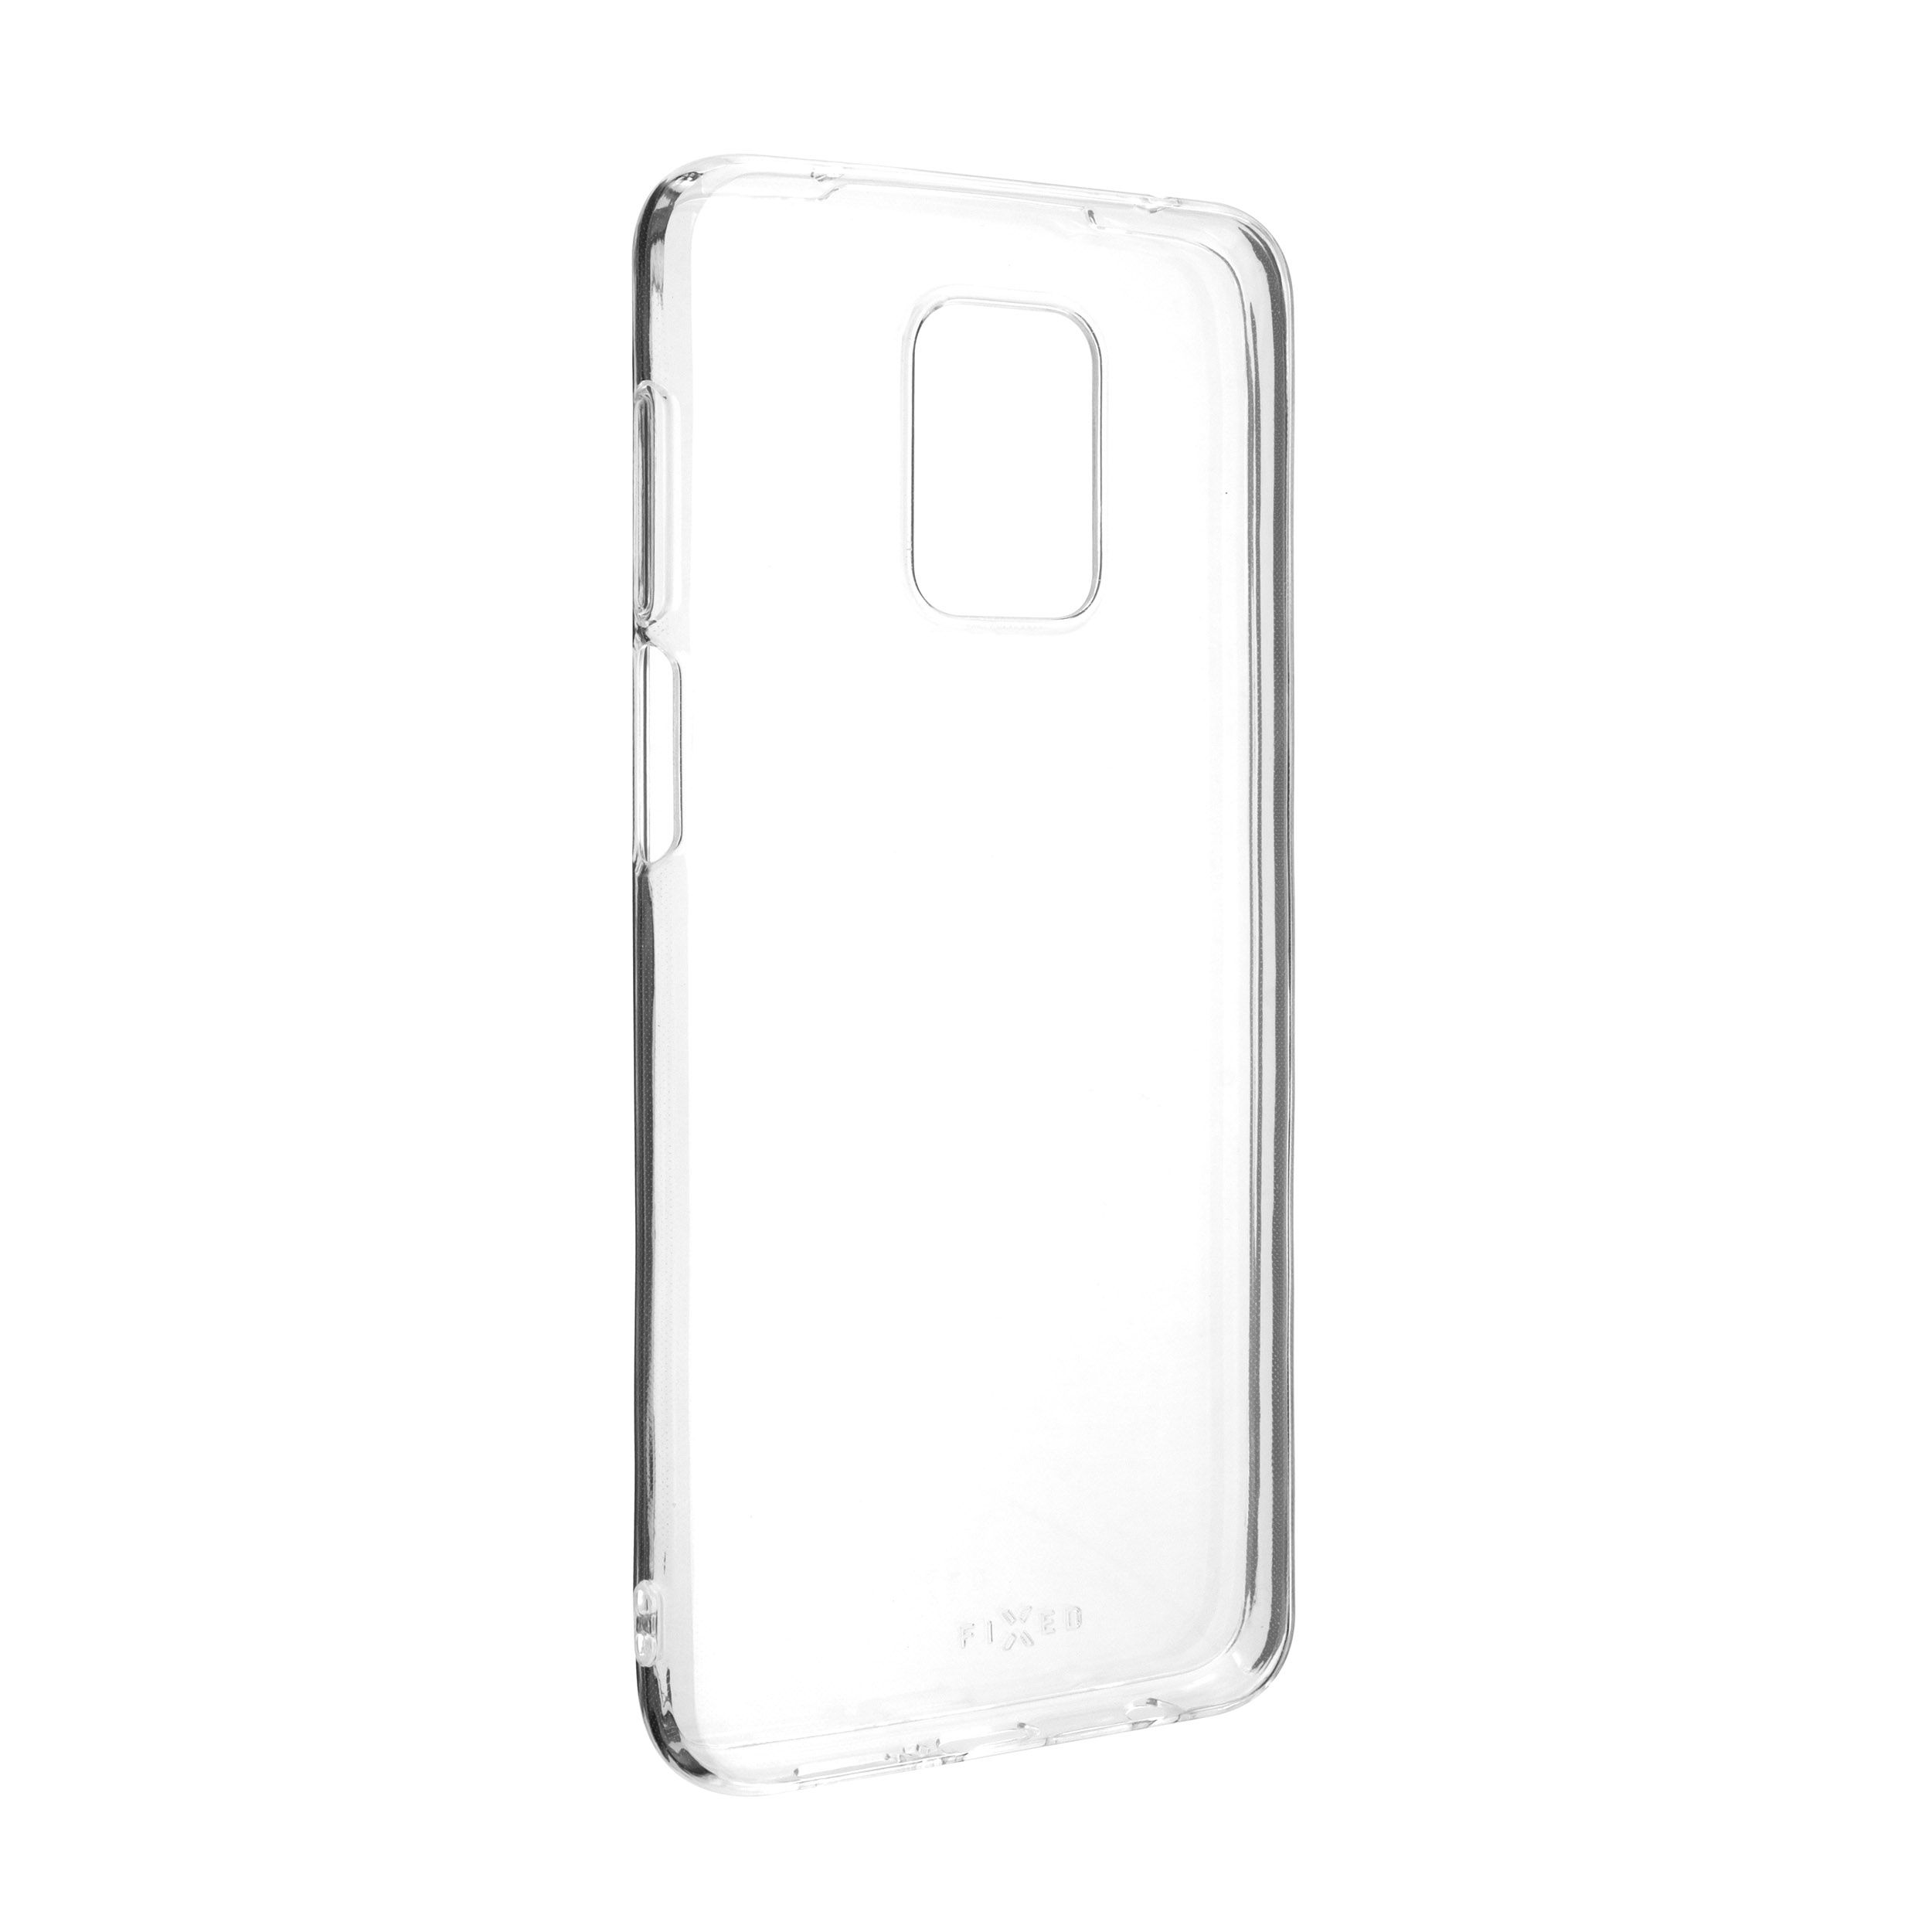 Ultratenké TPU gelové pouzdro FIXED Skin pro Redmi Note 9 Pro/9 Pro Max/Note 9S, 0,6 mm, čiré